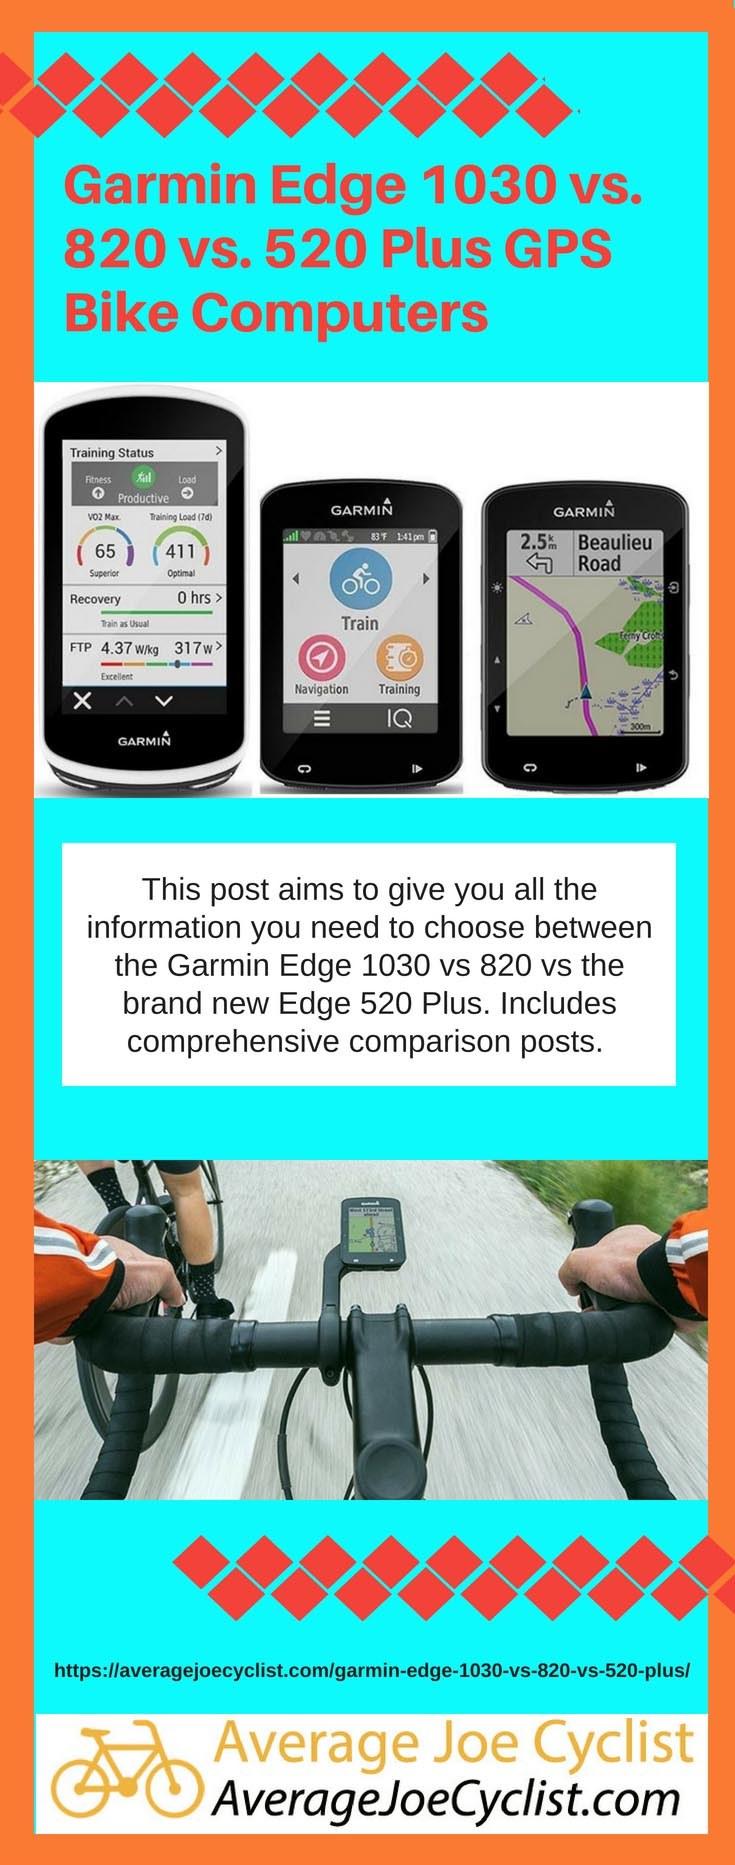 Garmin Edge 1030 vs 820 vs 520 Plus GPS Bike Computers